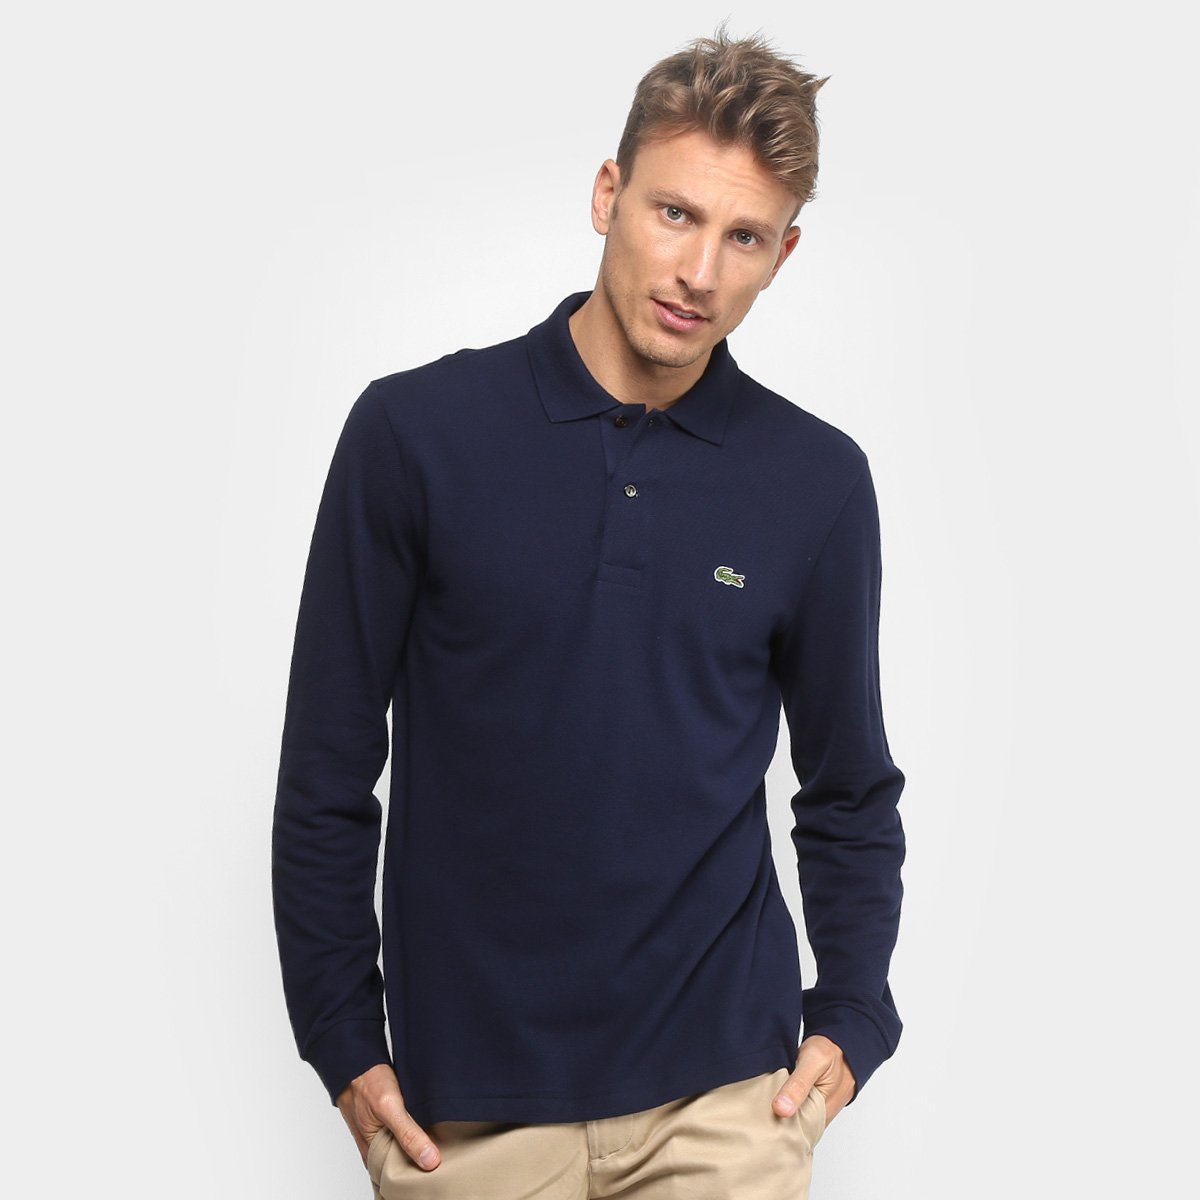 aedf4b9281f Camisa Polo Lacoste Manga Longa Piquet Masculina - Marinho - Compre Agora